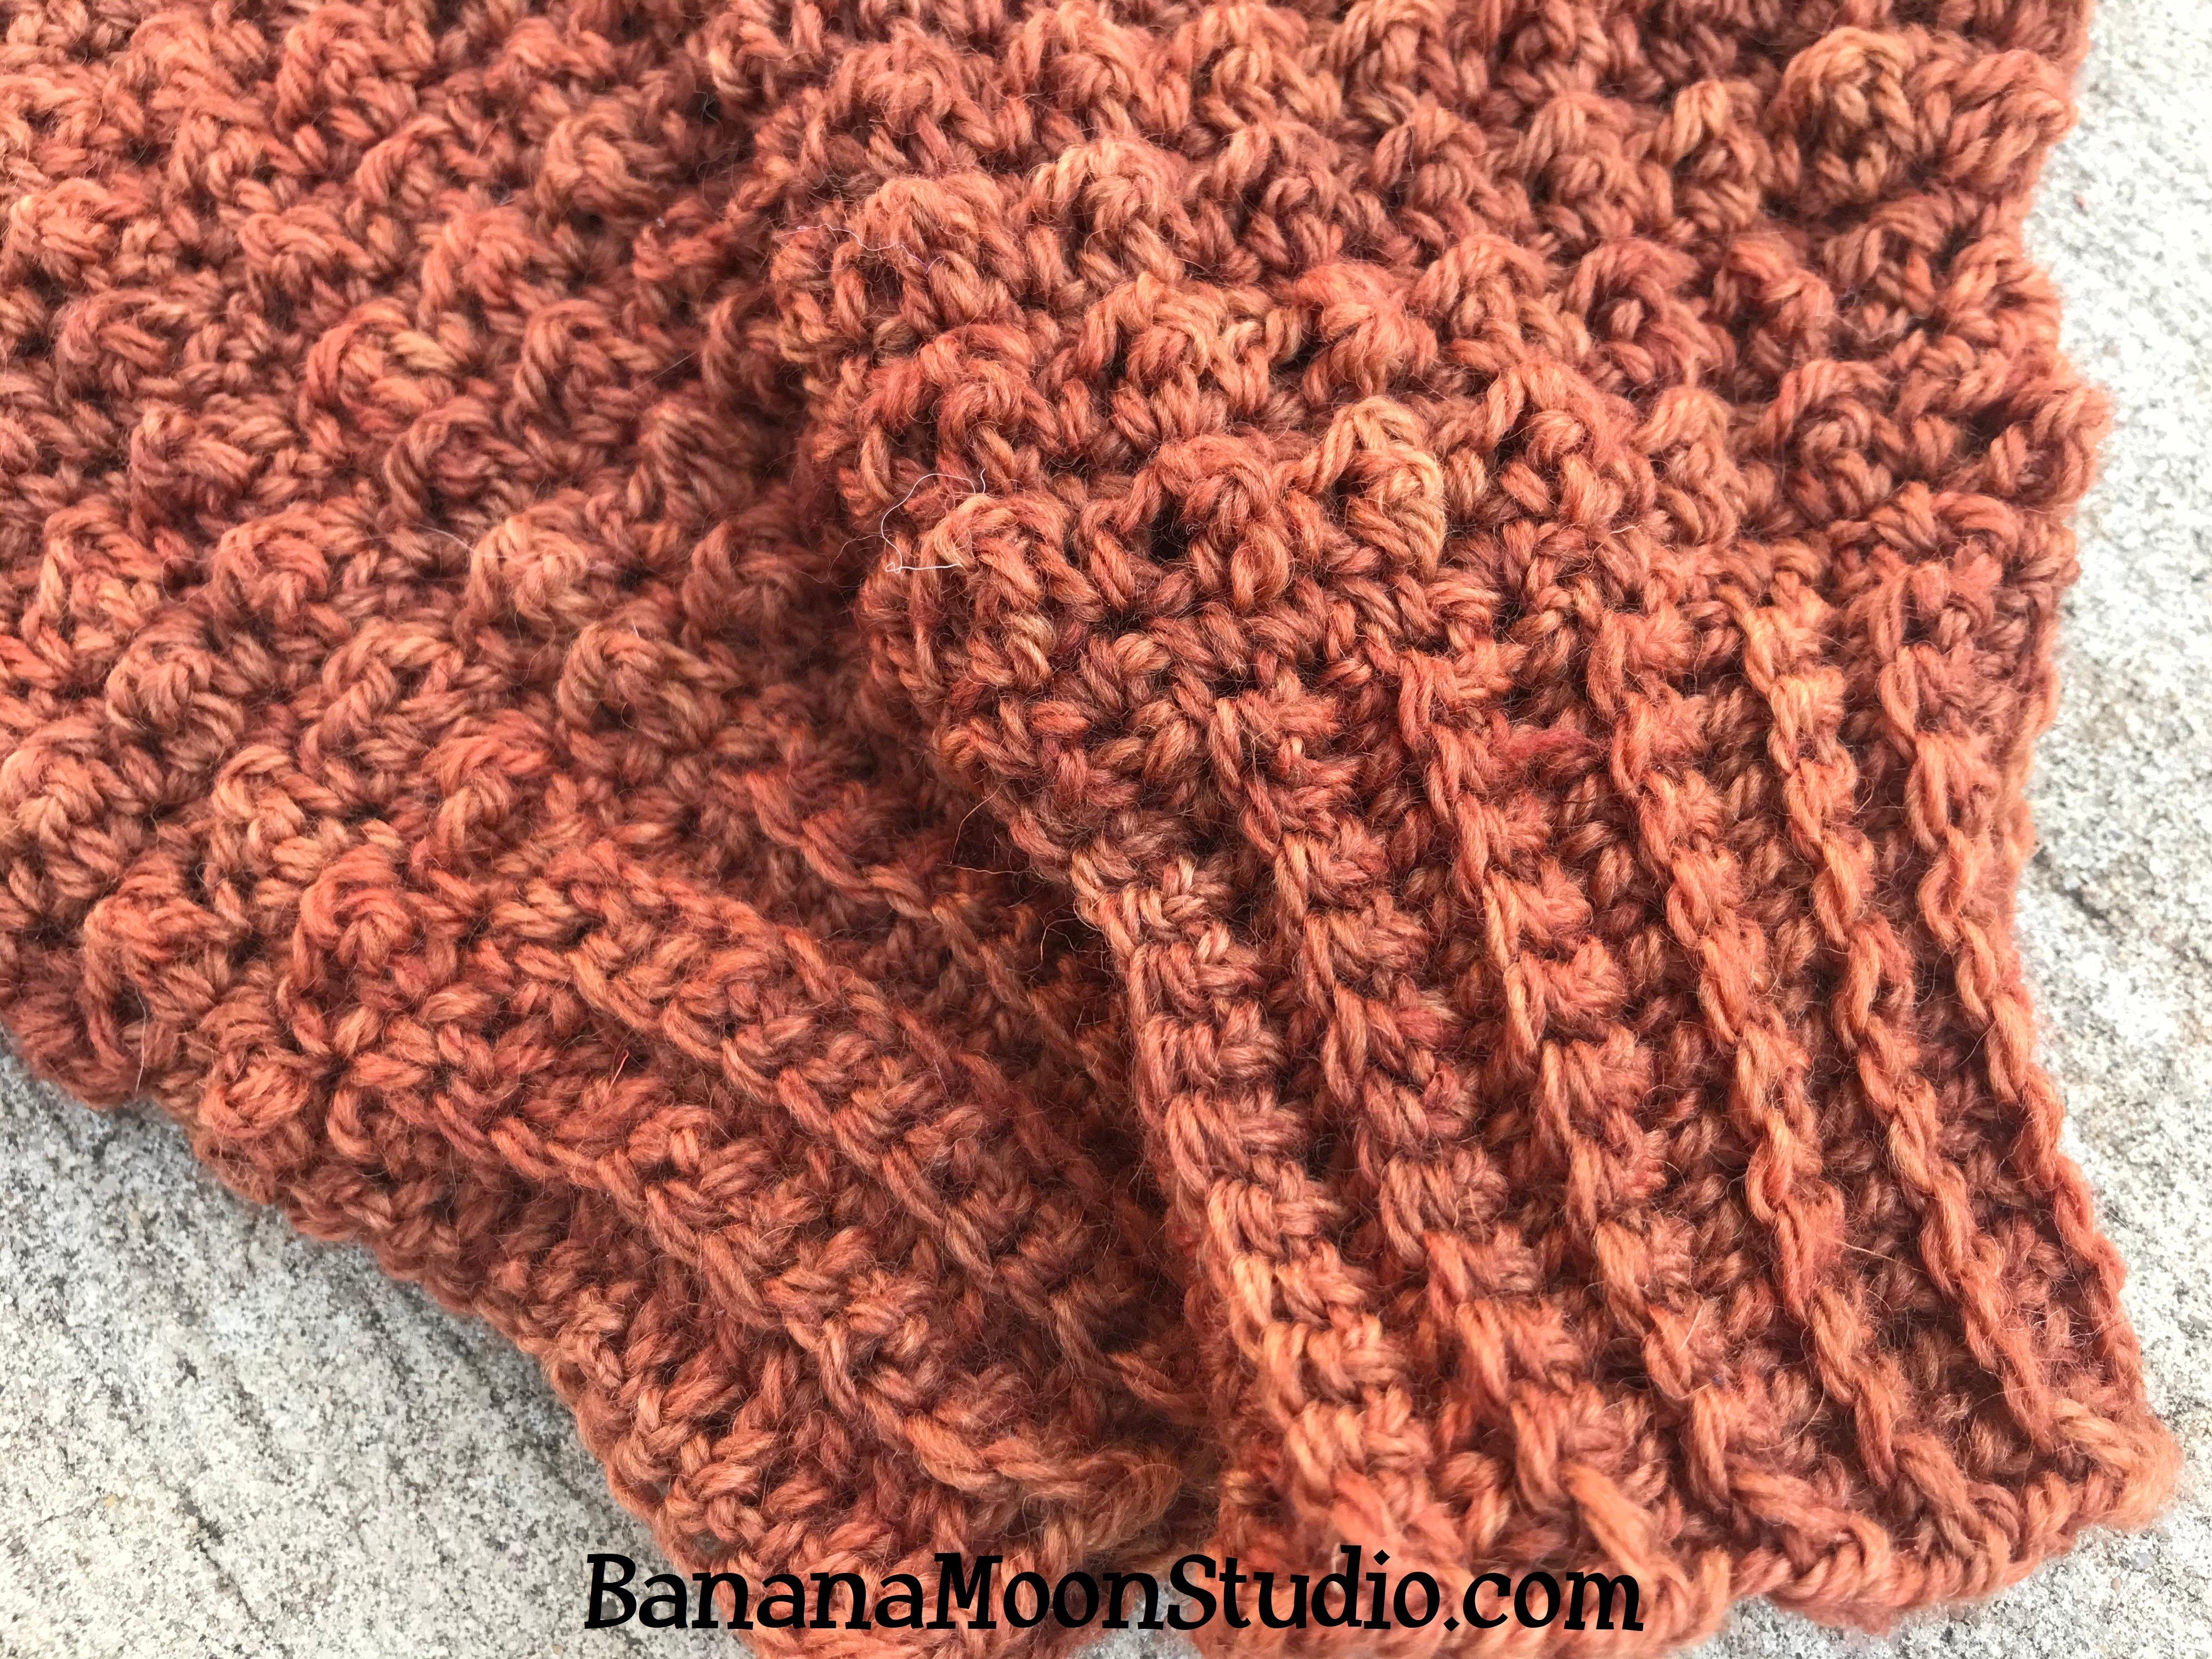 Free Crochet Mitten Pattern from Banana Moon Studio